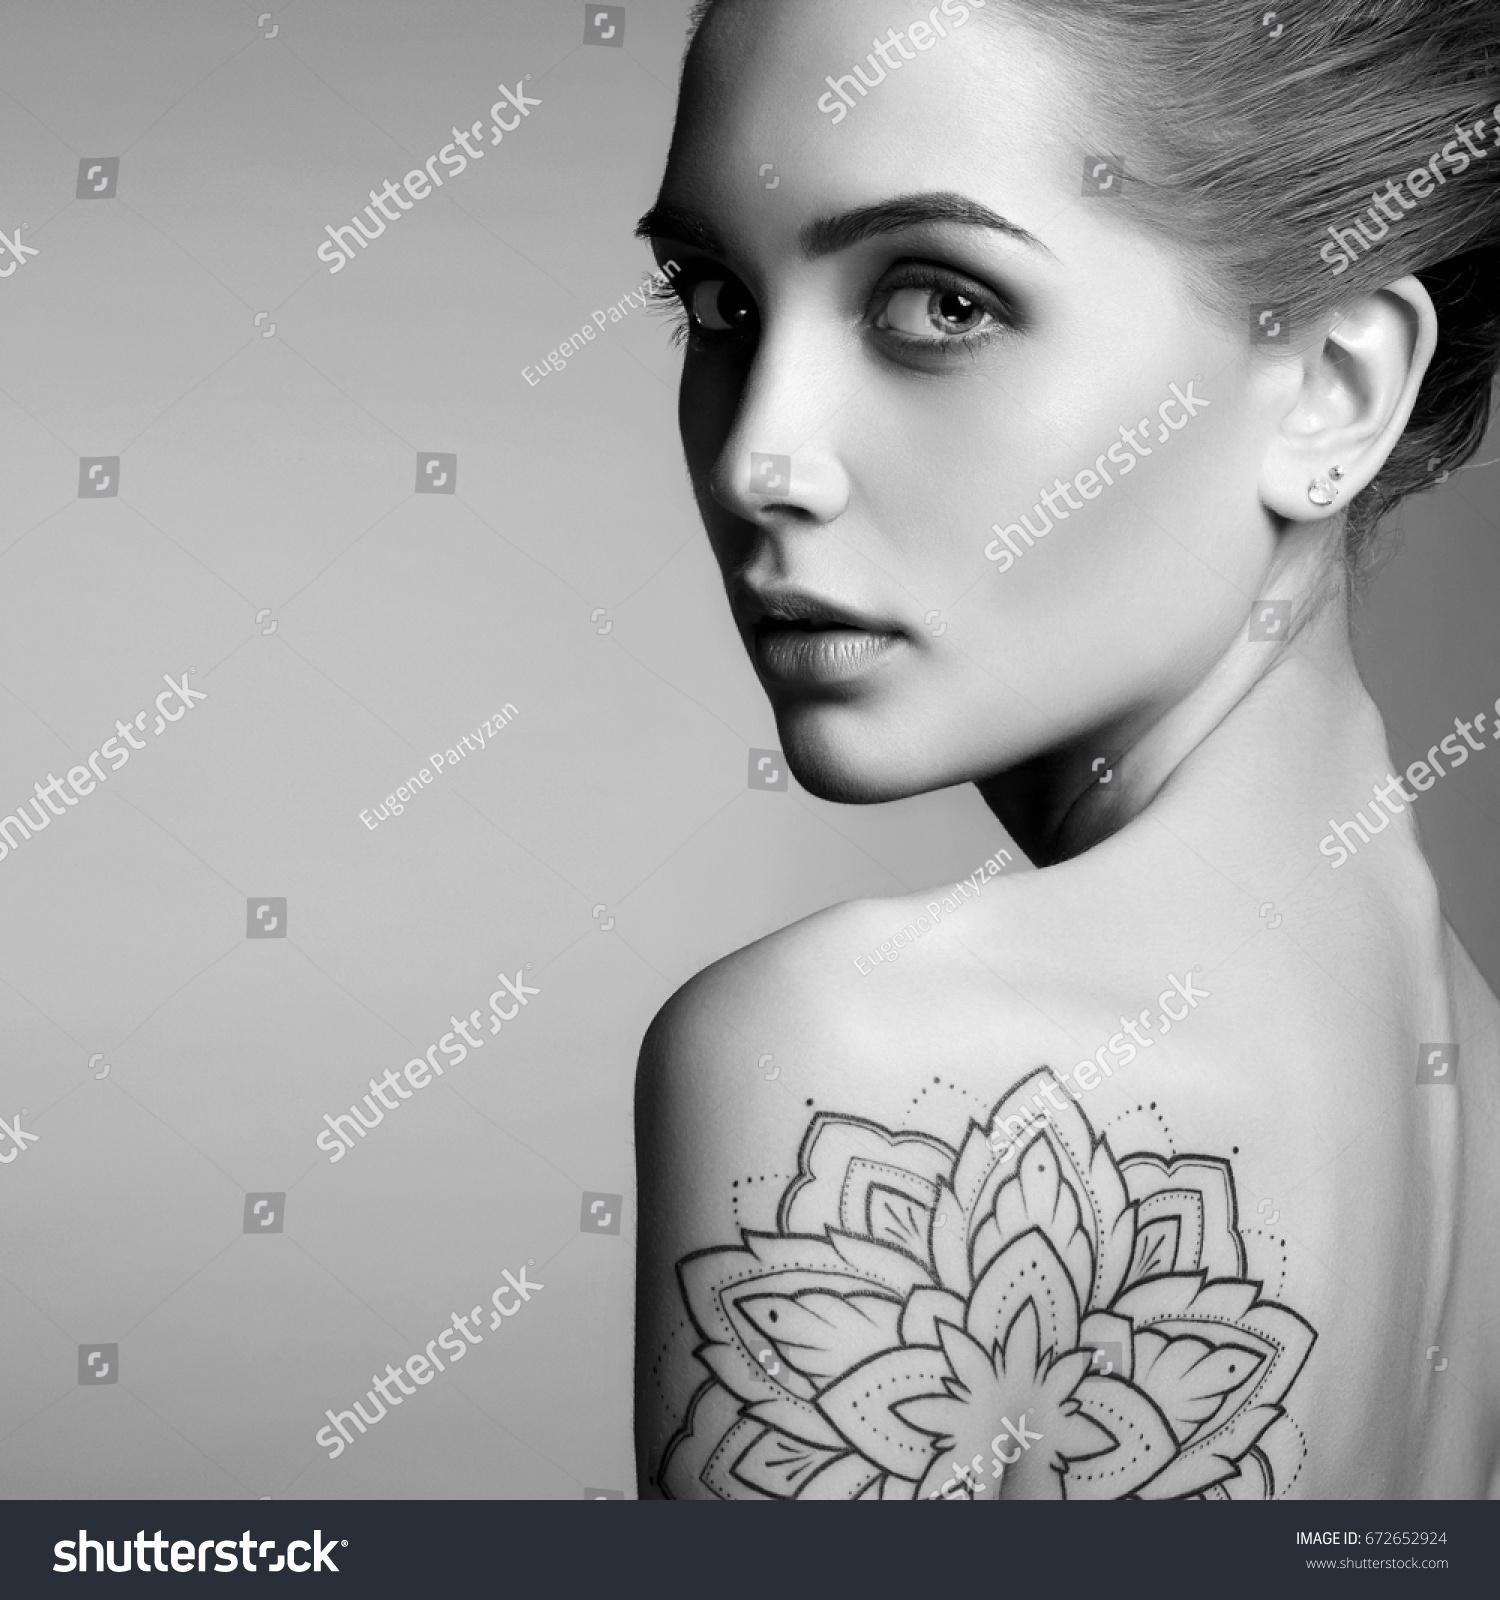 Huge natural latina boobs tumblr